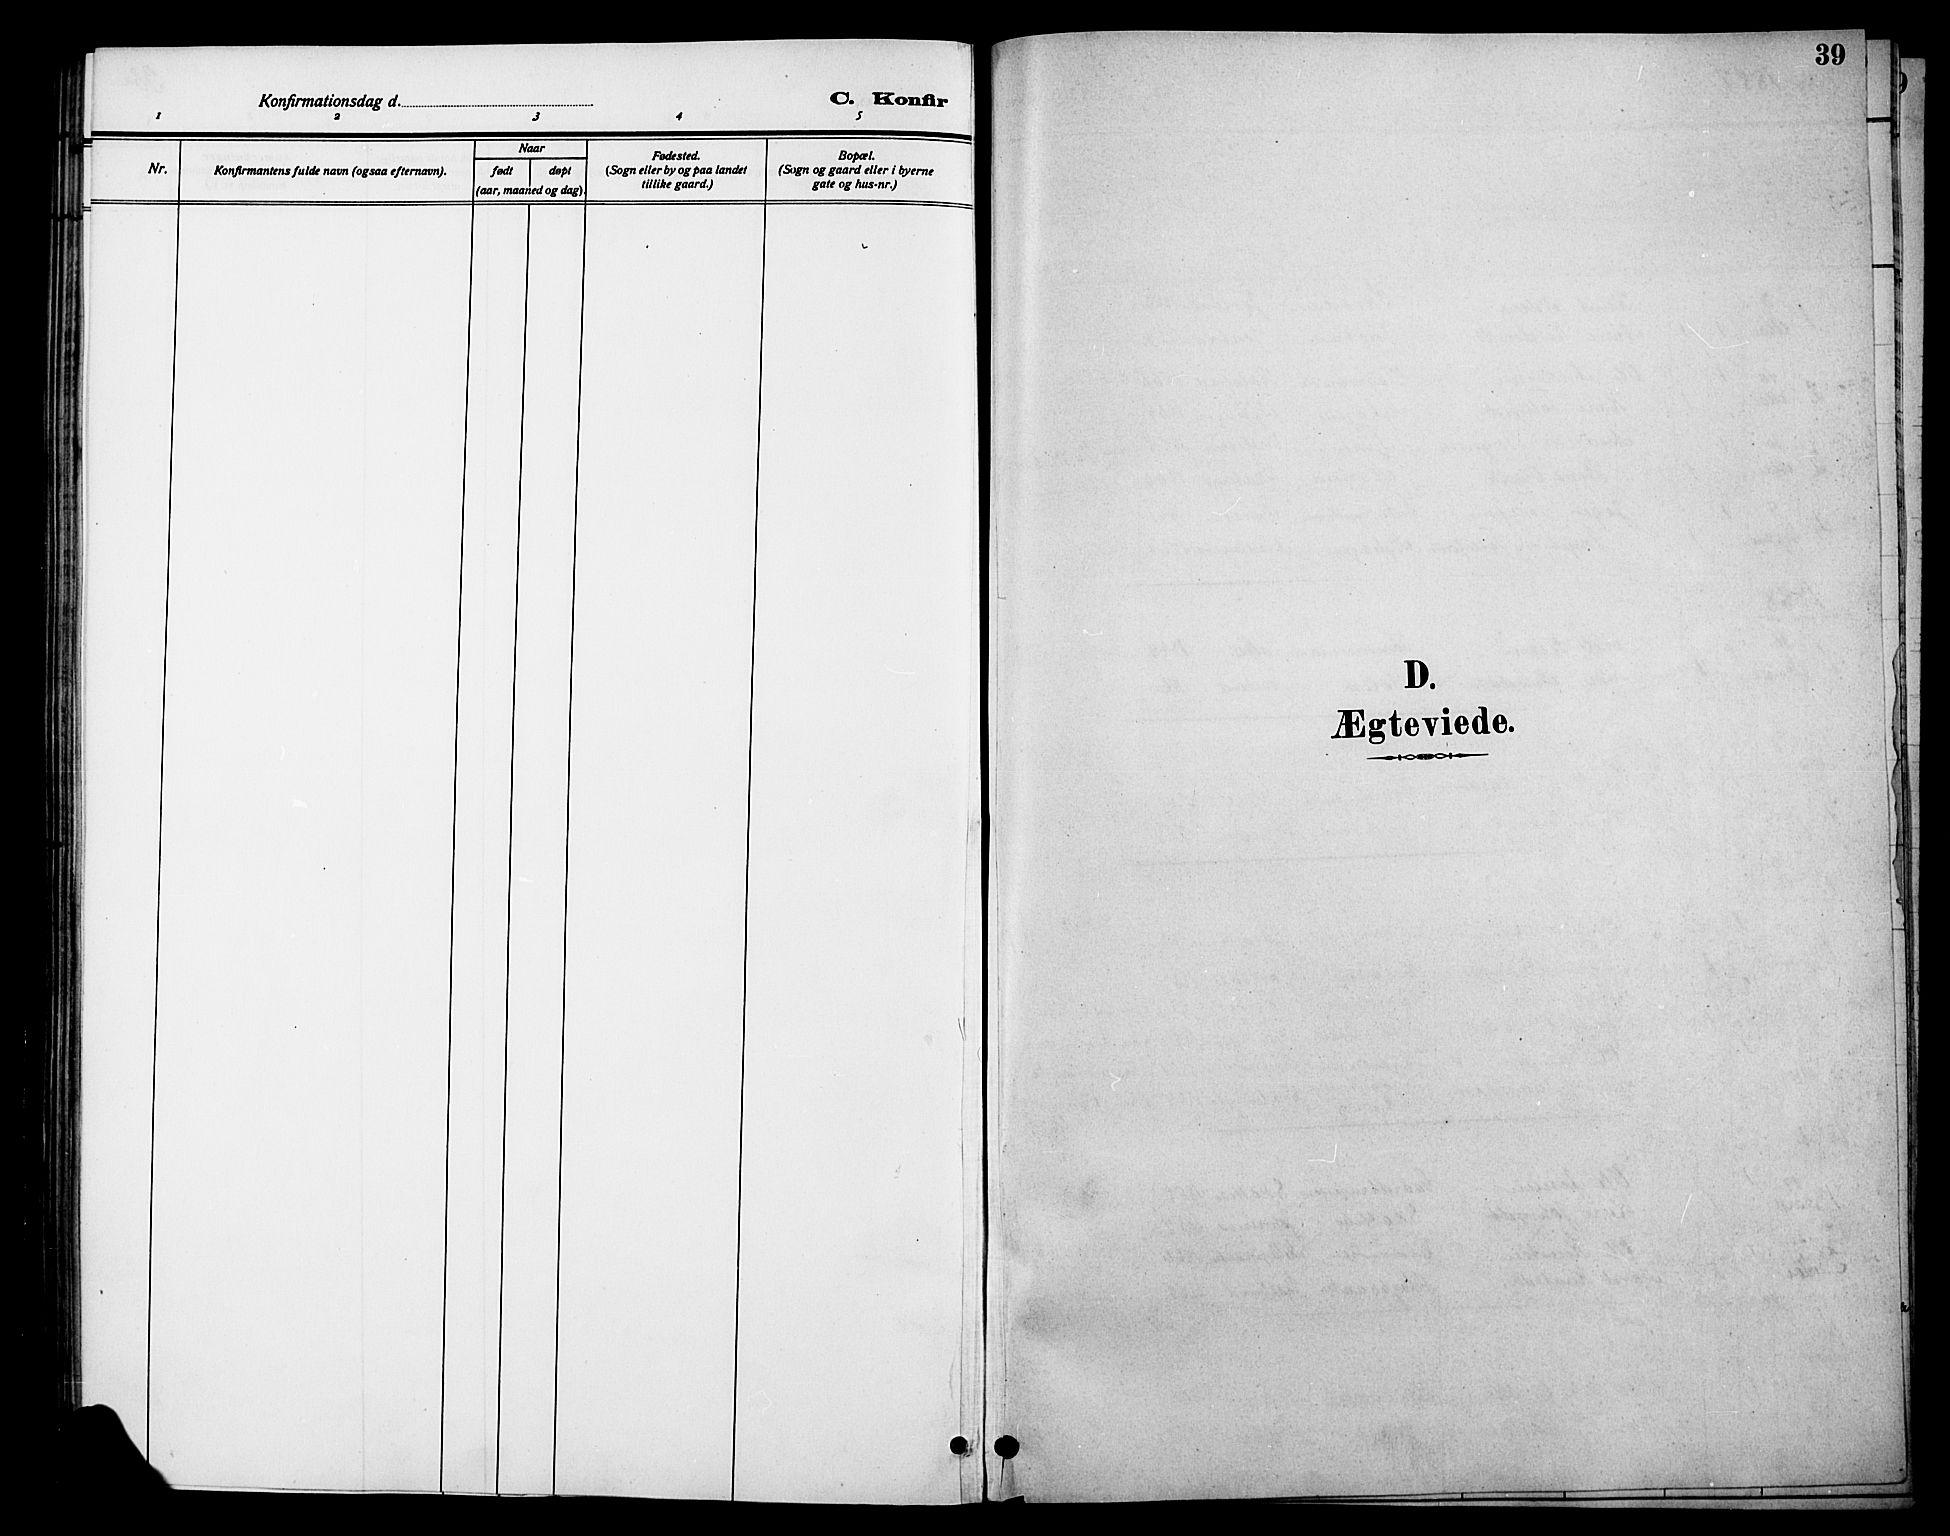 SAH, Øystre Slidre prestekontor, Klokkerbok nr. 6, 1887-1916, s. 39